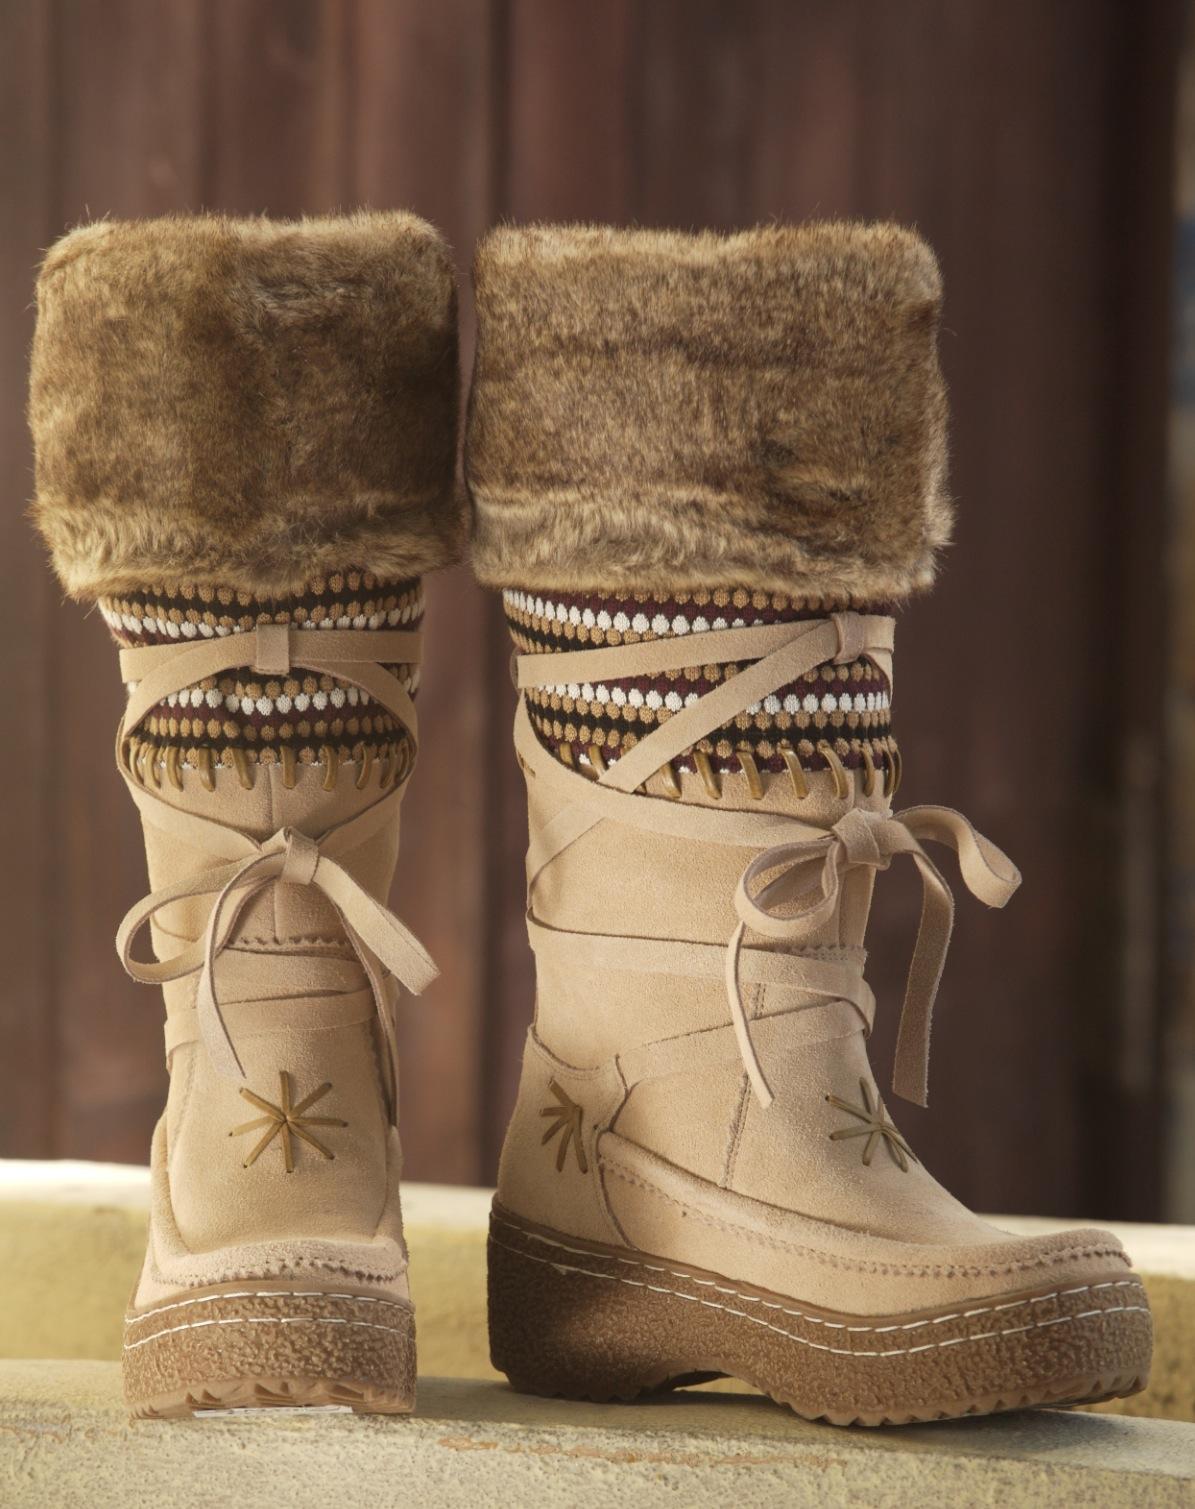 eskimoo boot.jpg